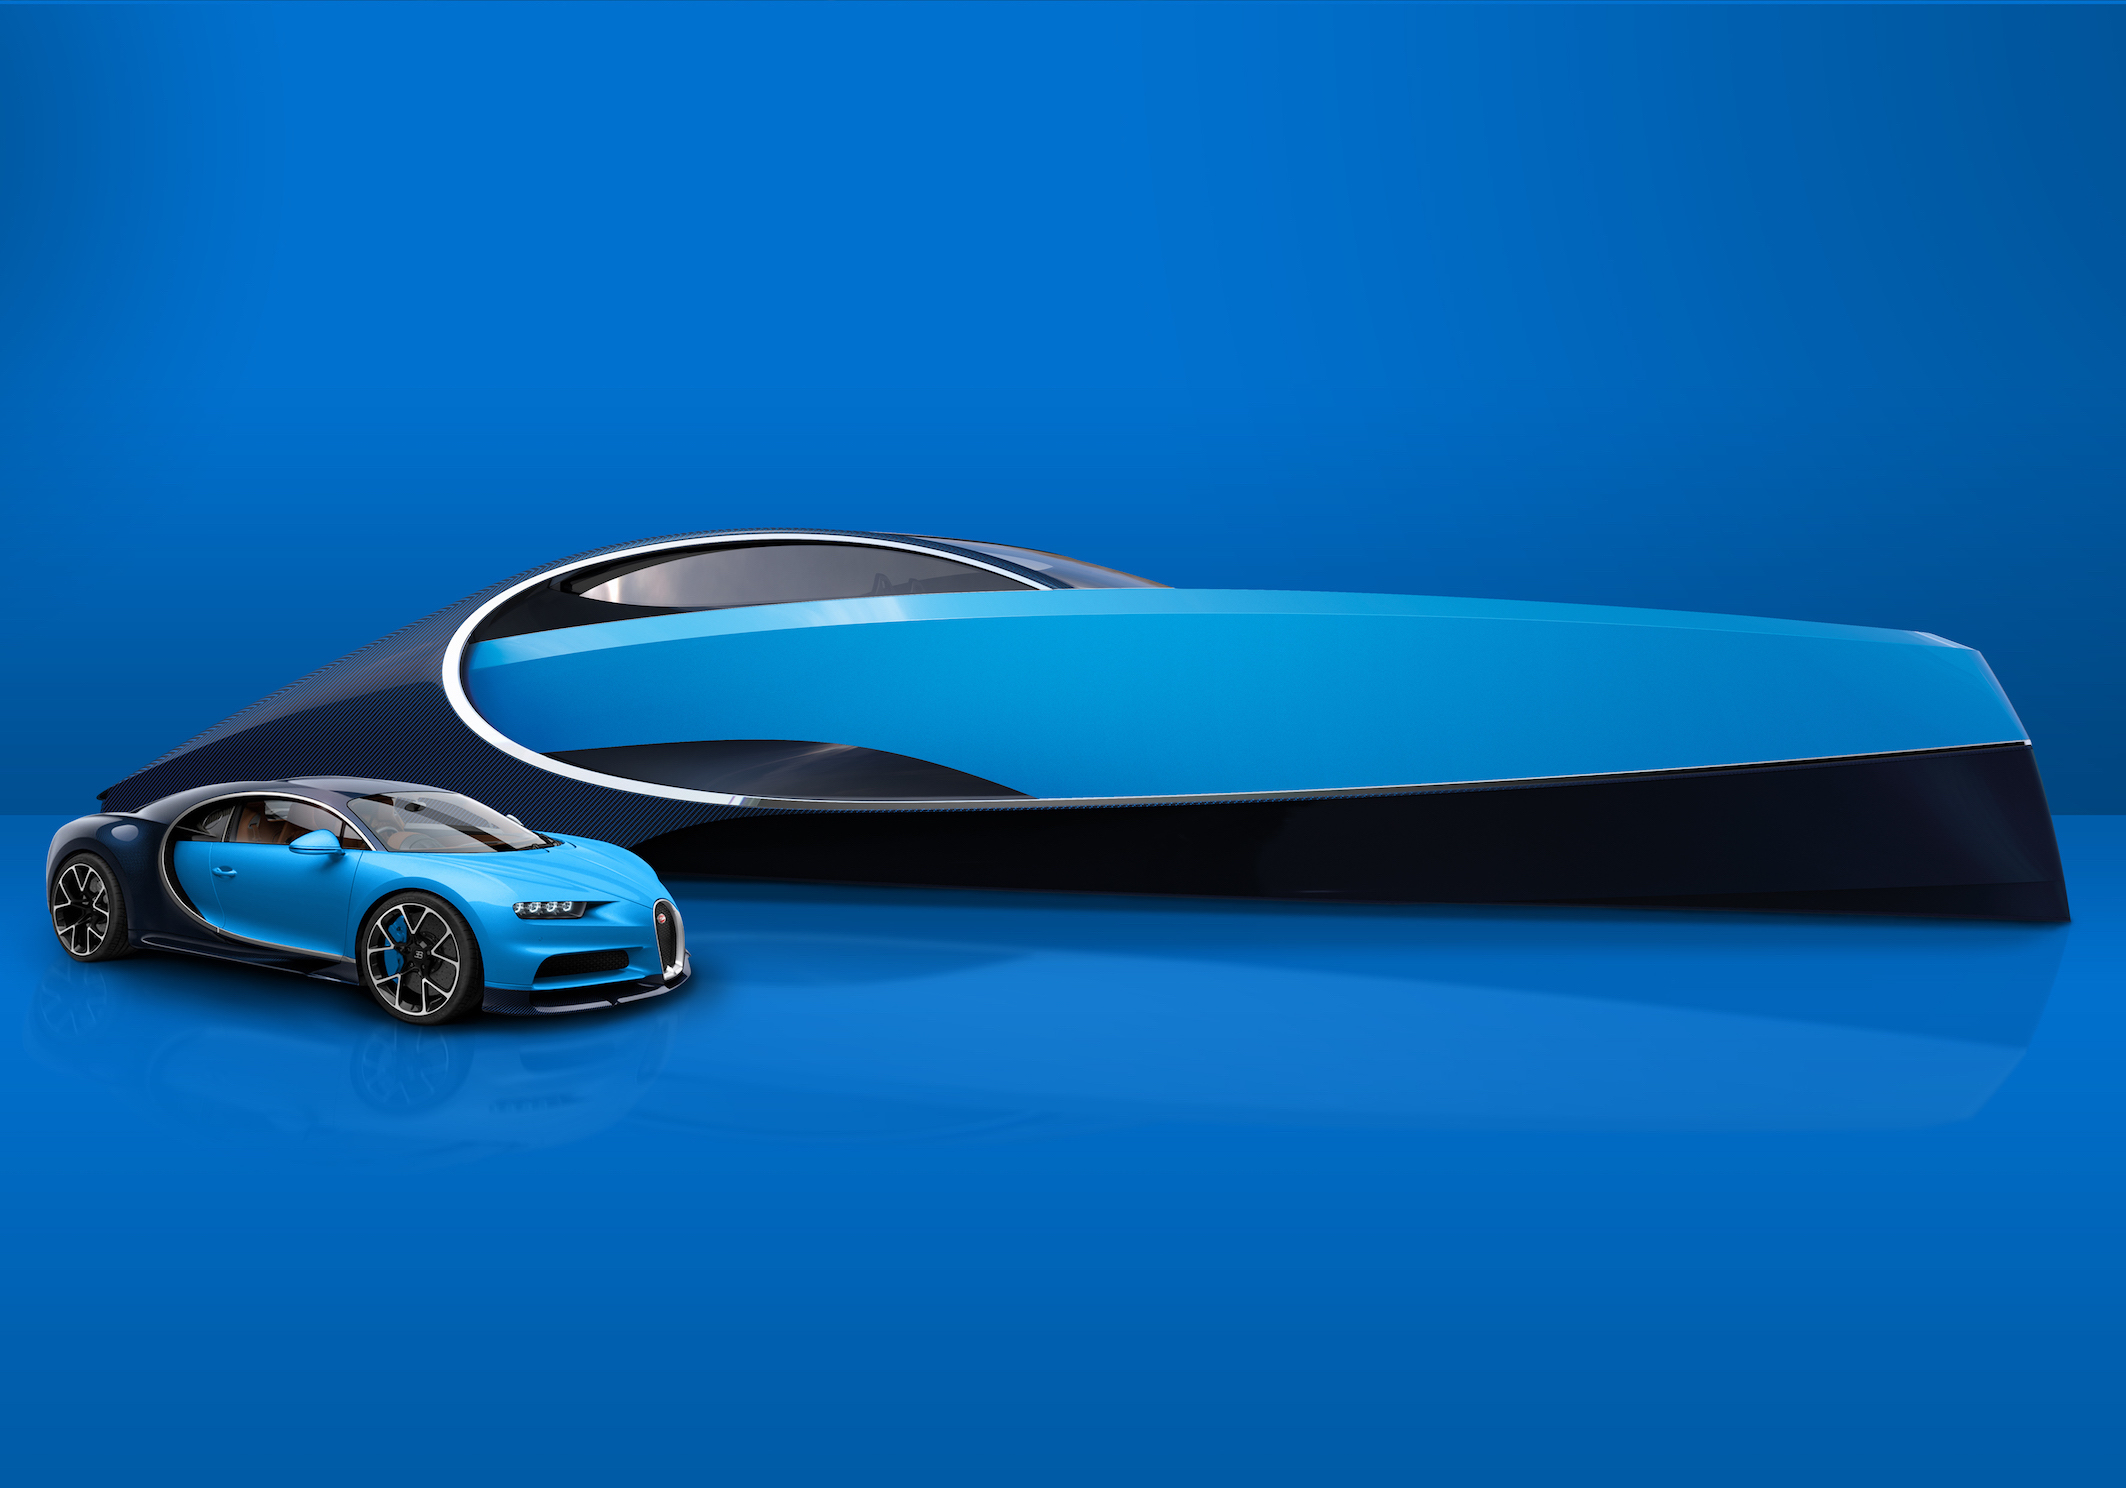 Bugatti+Niniette+66+&+Chiron.jpg?format=